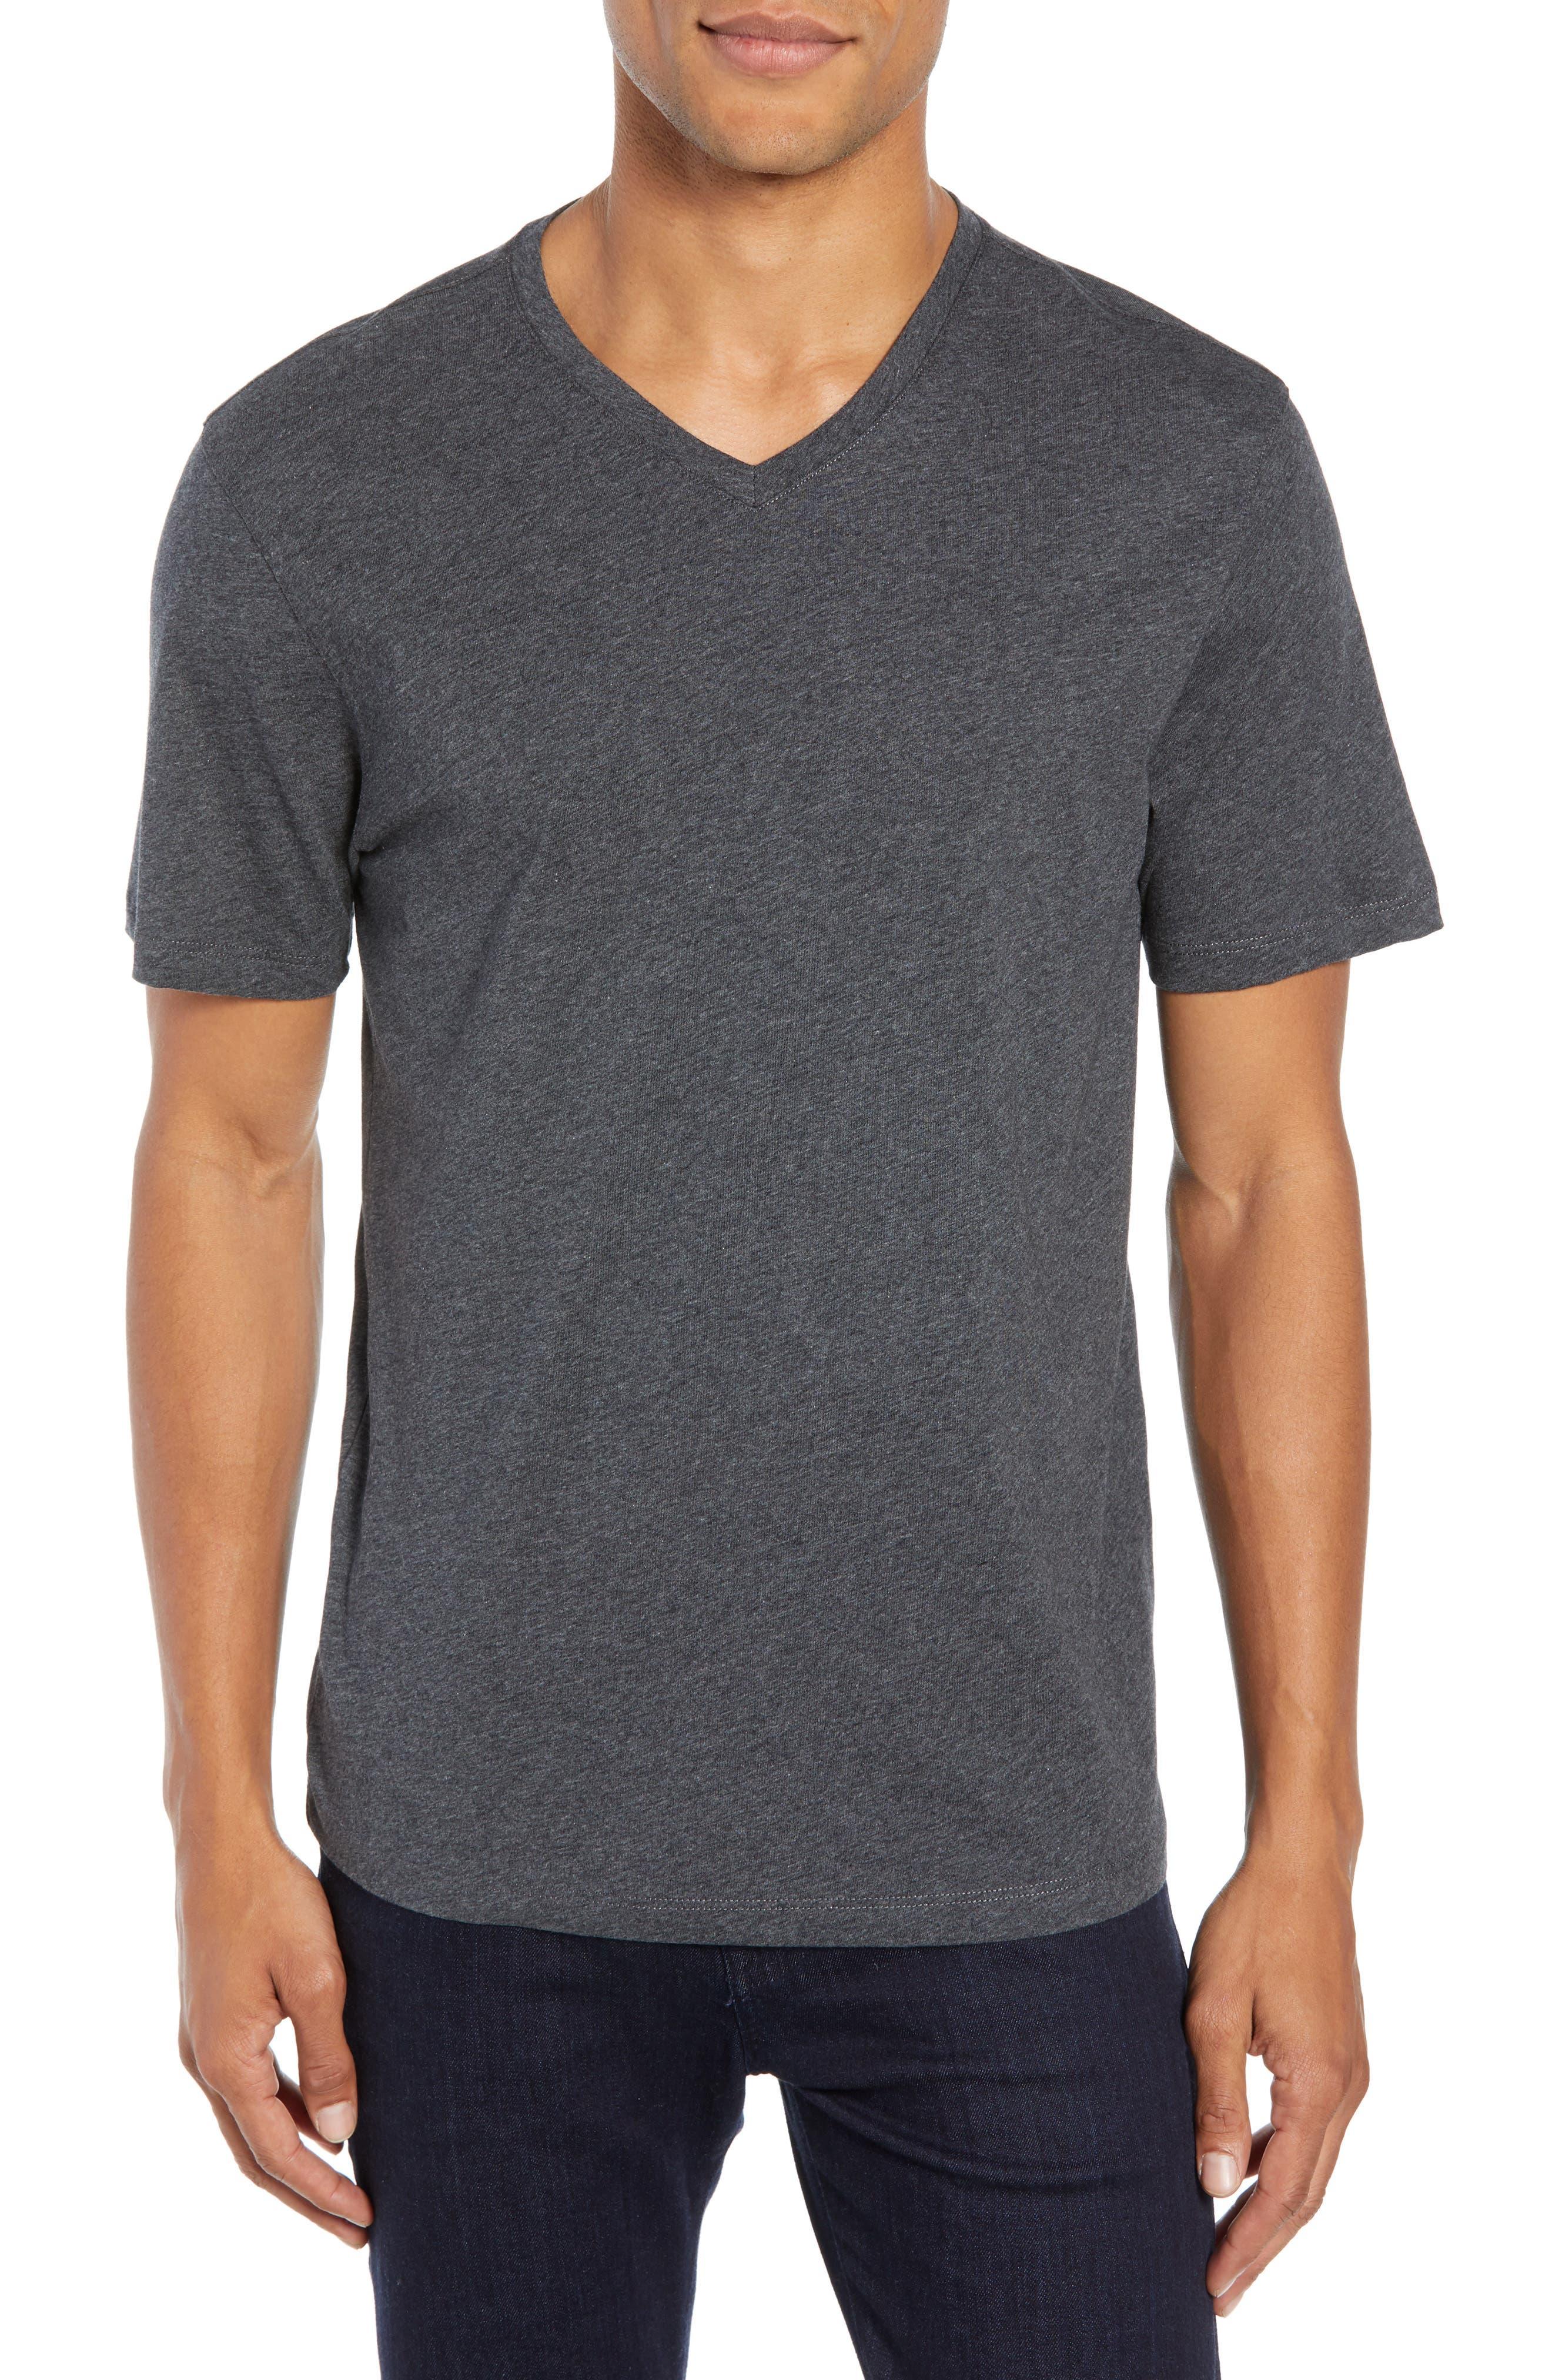 Mercer V-Neck T-Shirt,                             Main thumbnail 1, color,                             DARK HEATHER CHARCOAL